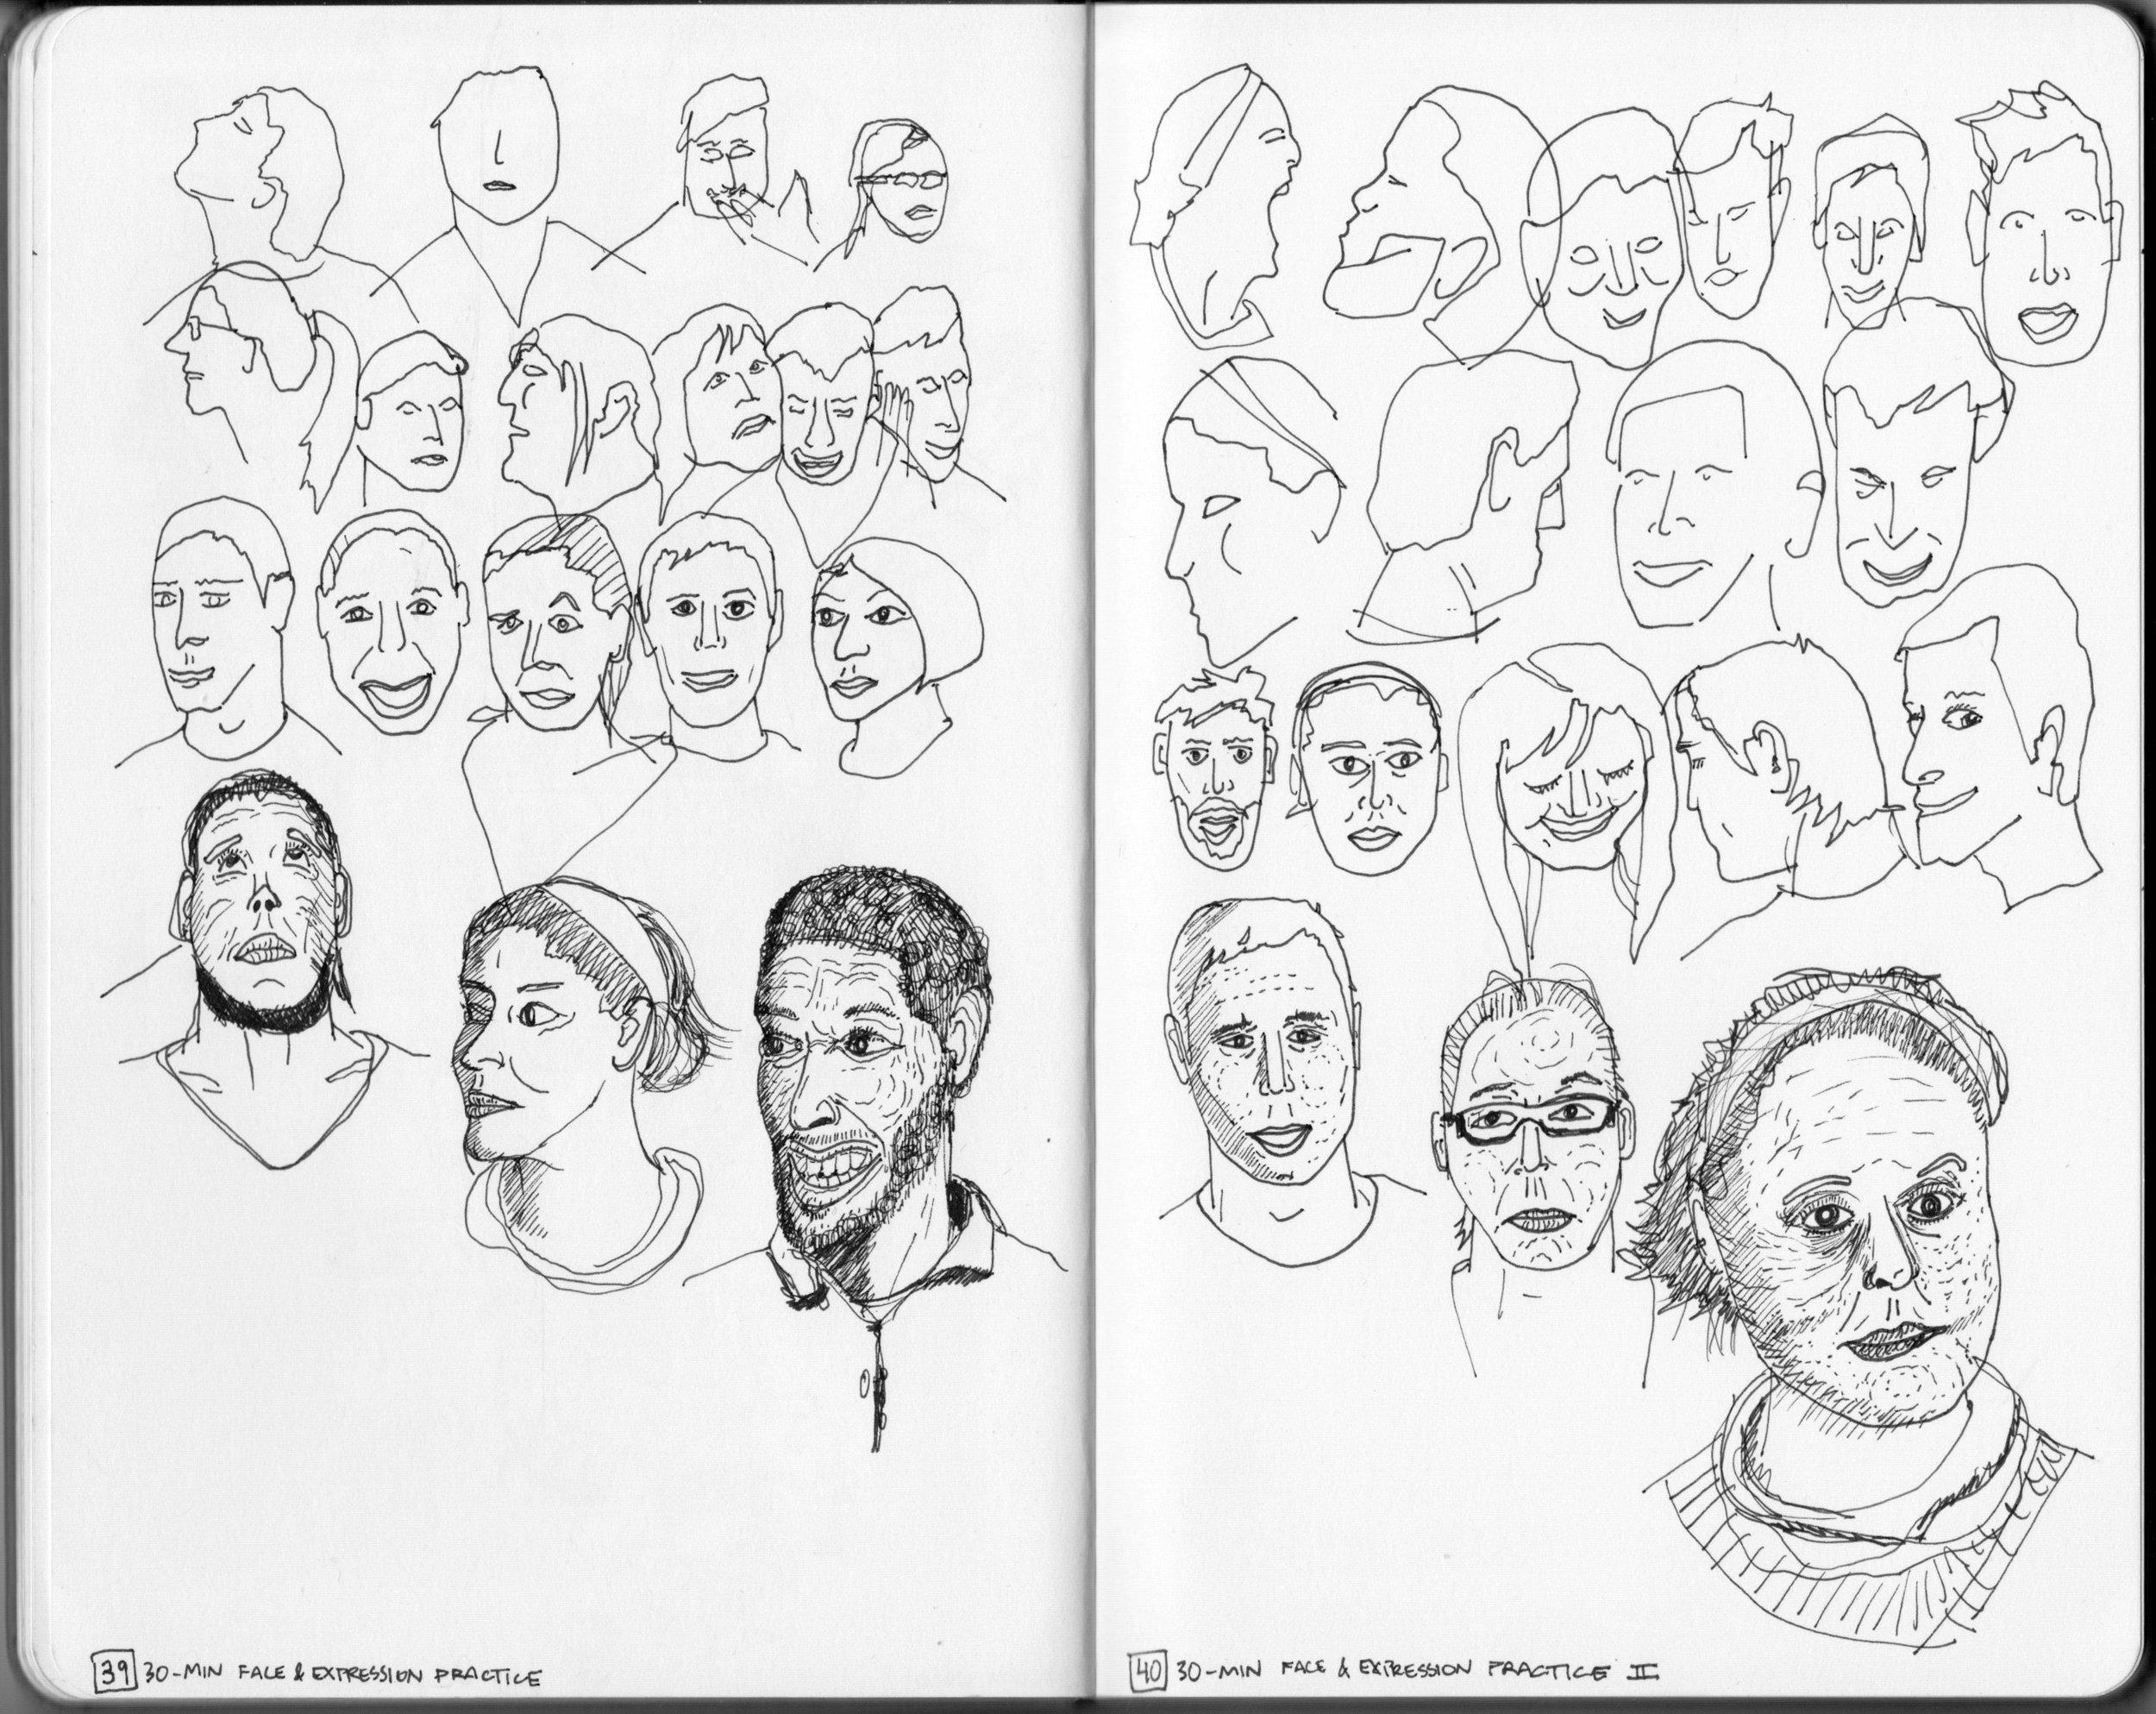 39 - 40 Face Studies.jpeg